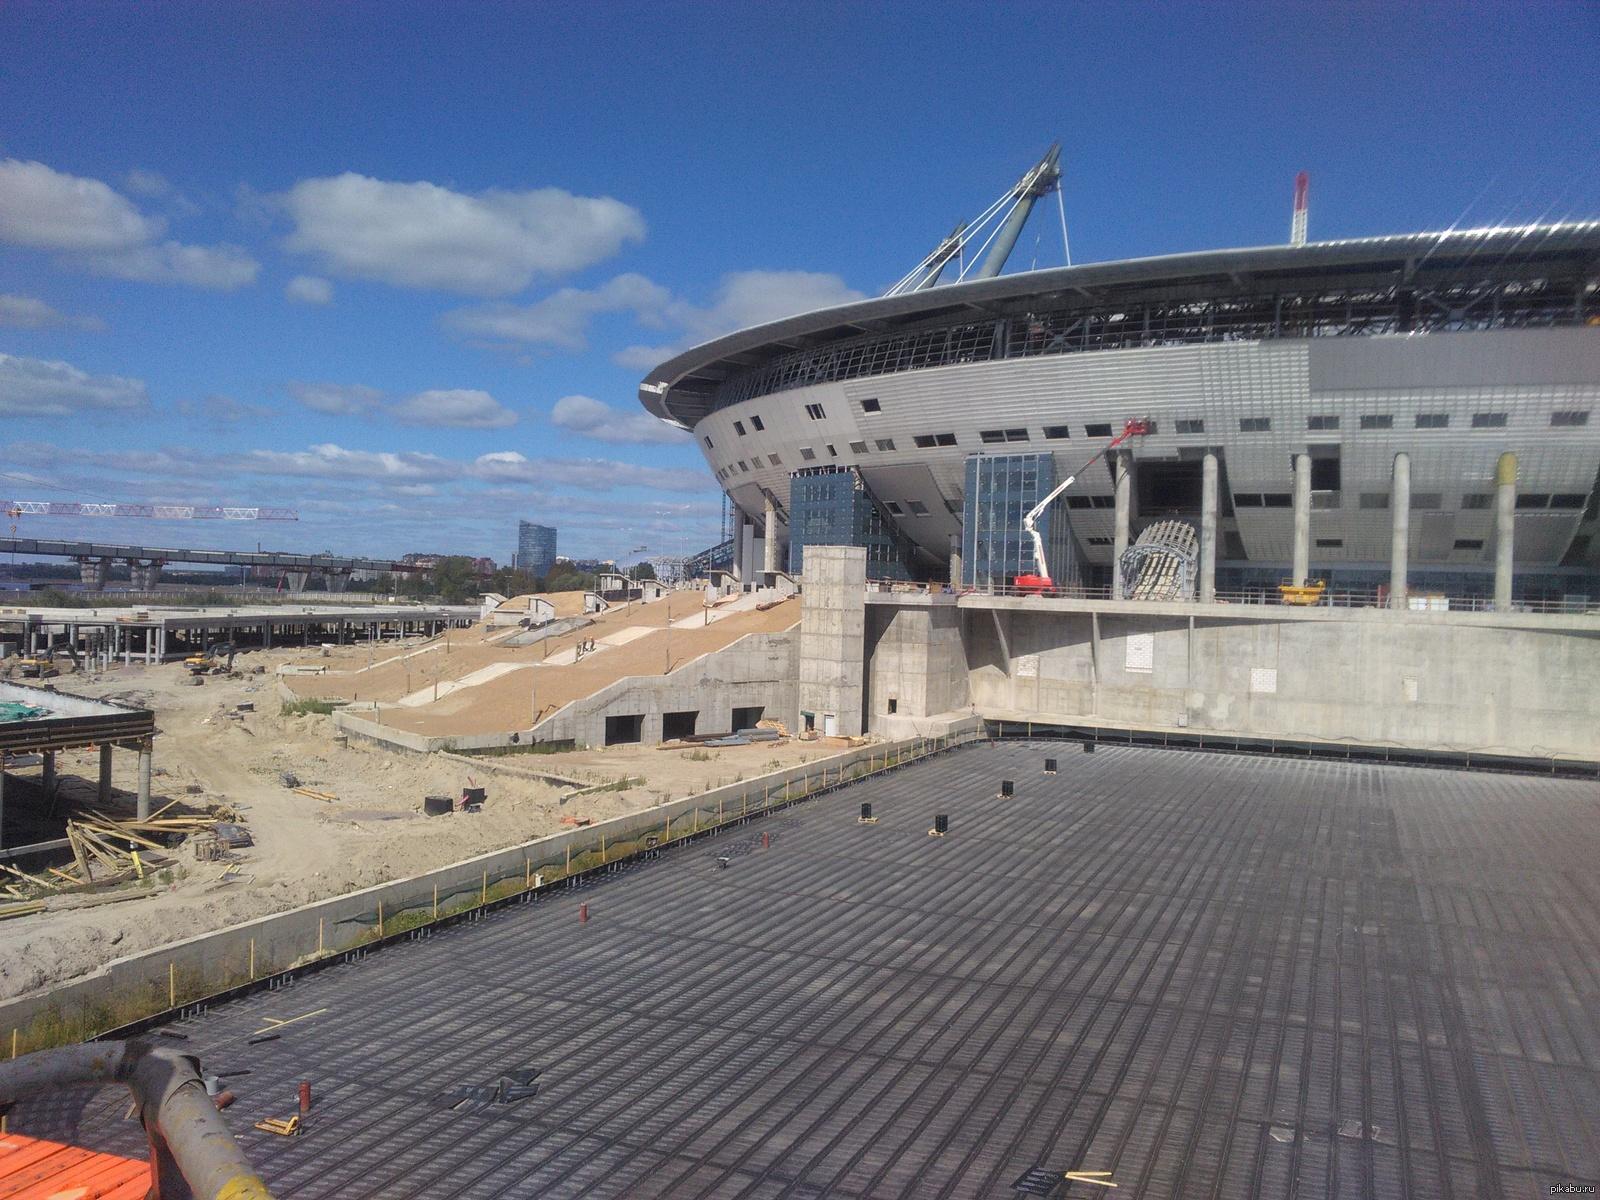 Zenit Arena Pikabu